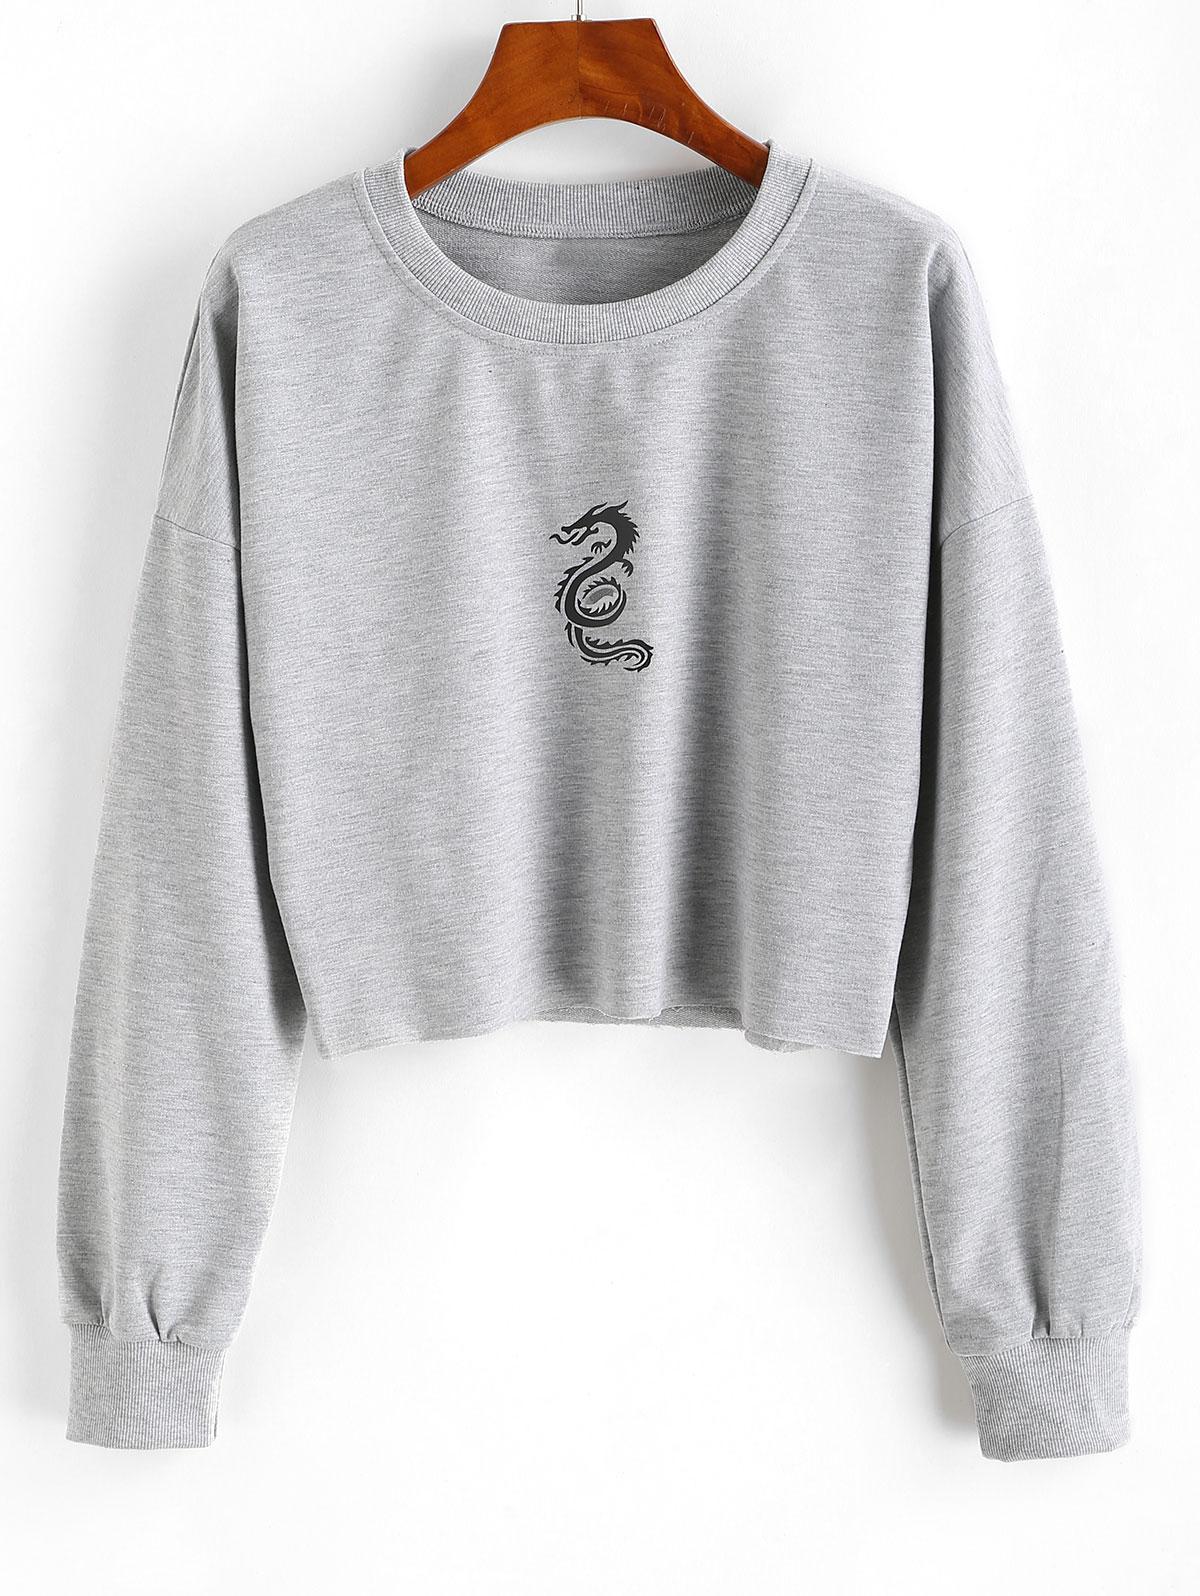 Dragon Graphic Raw Hem Drop Shoulder Sweatshirt